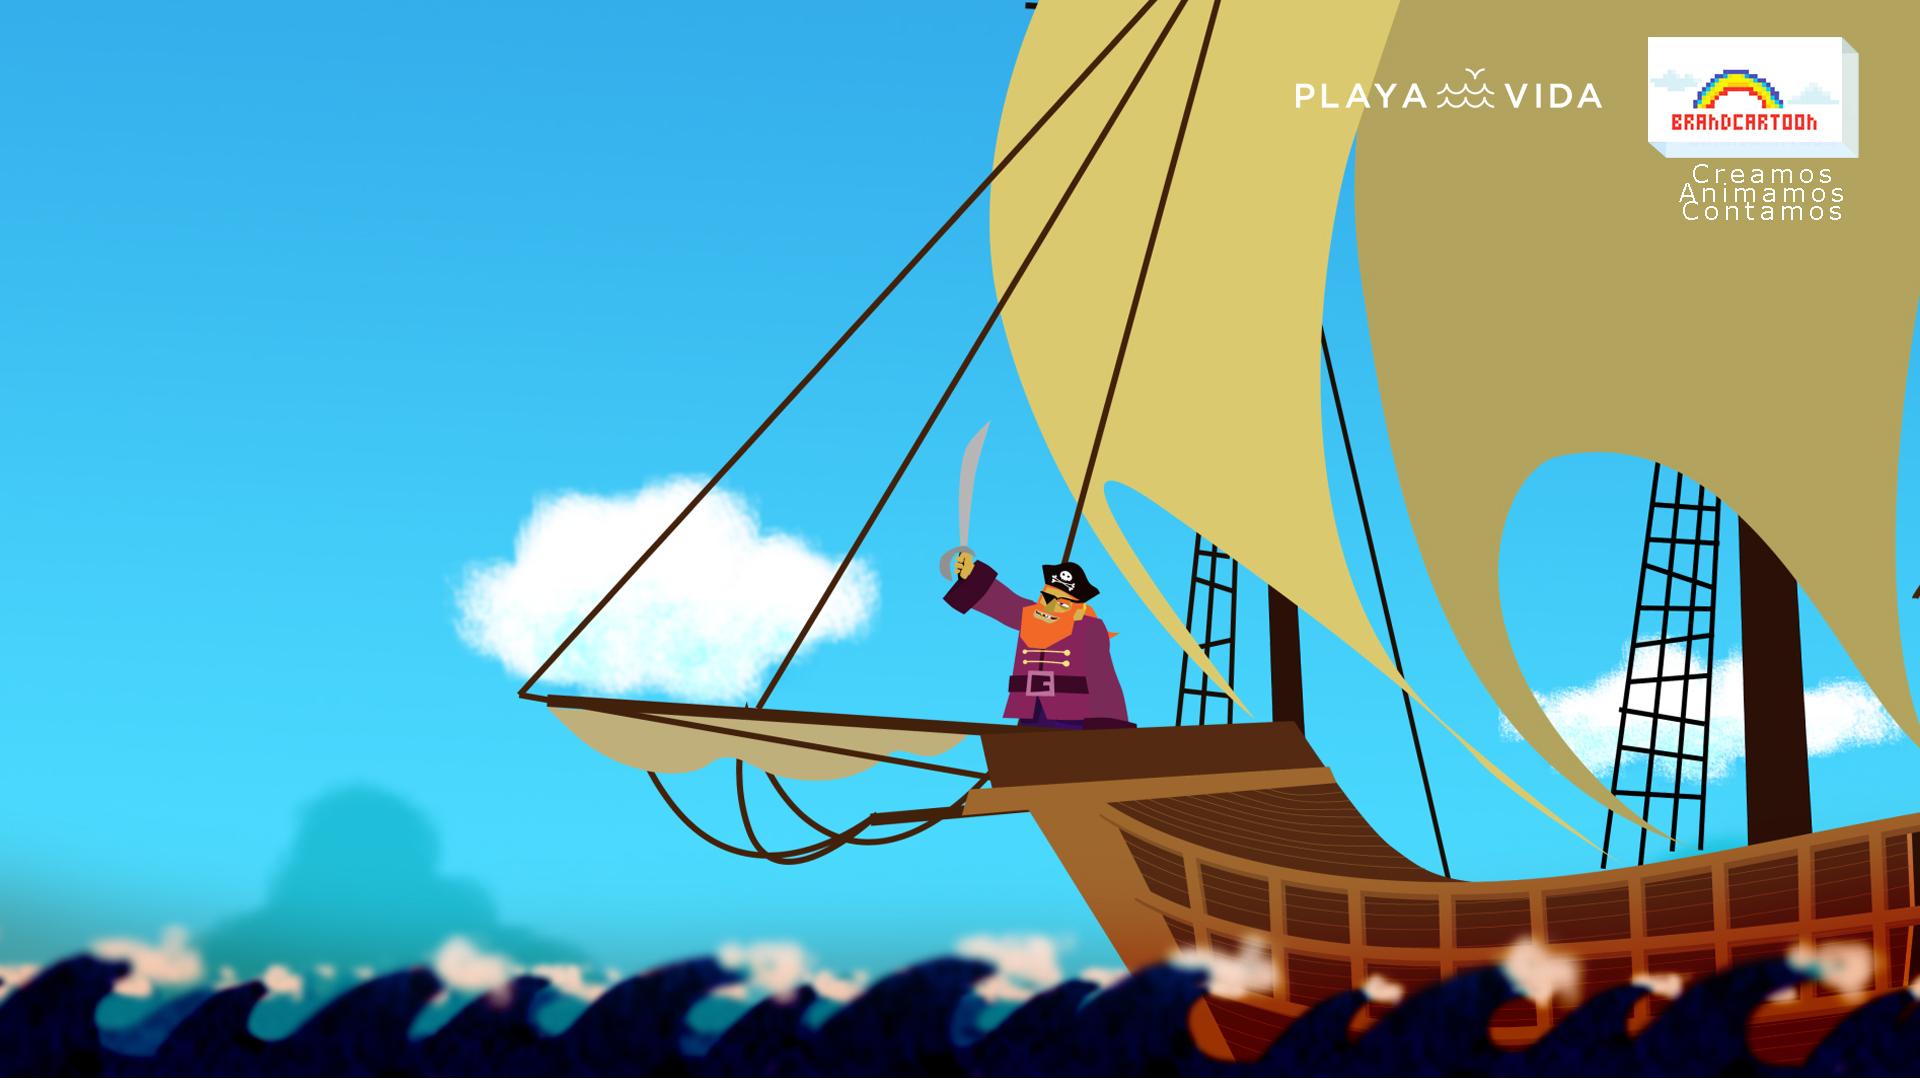 Pirata al ataque